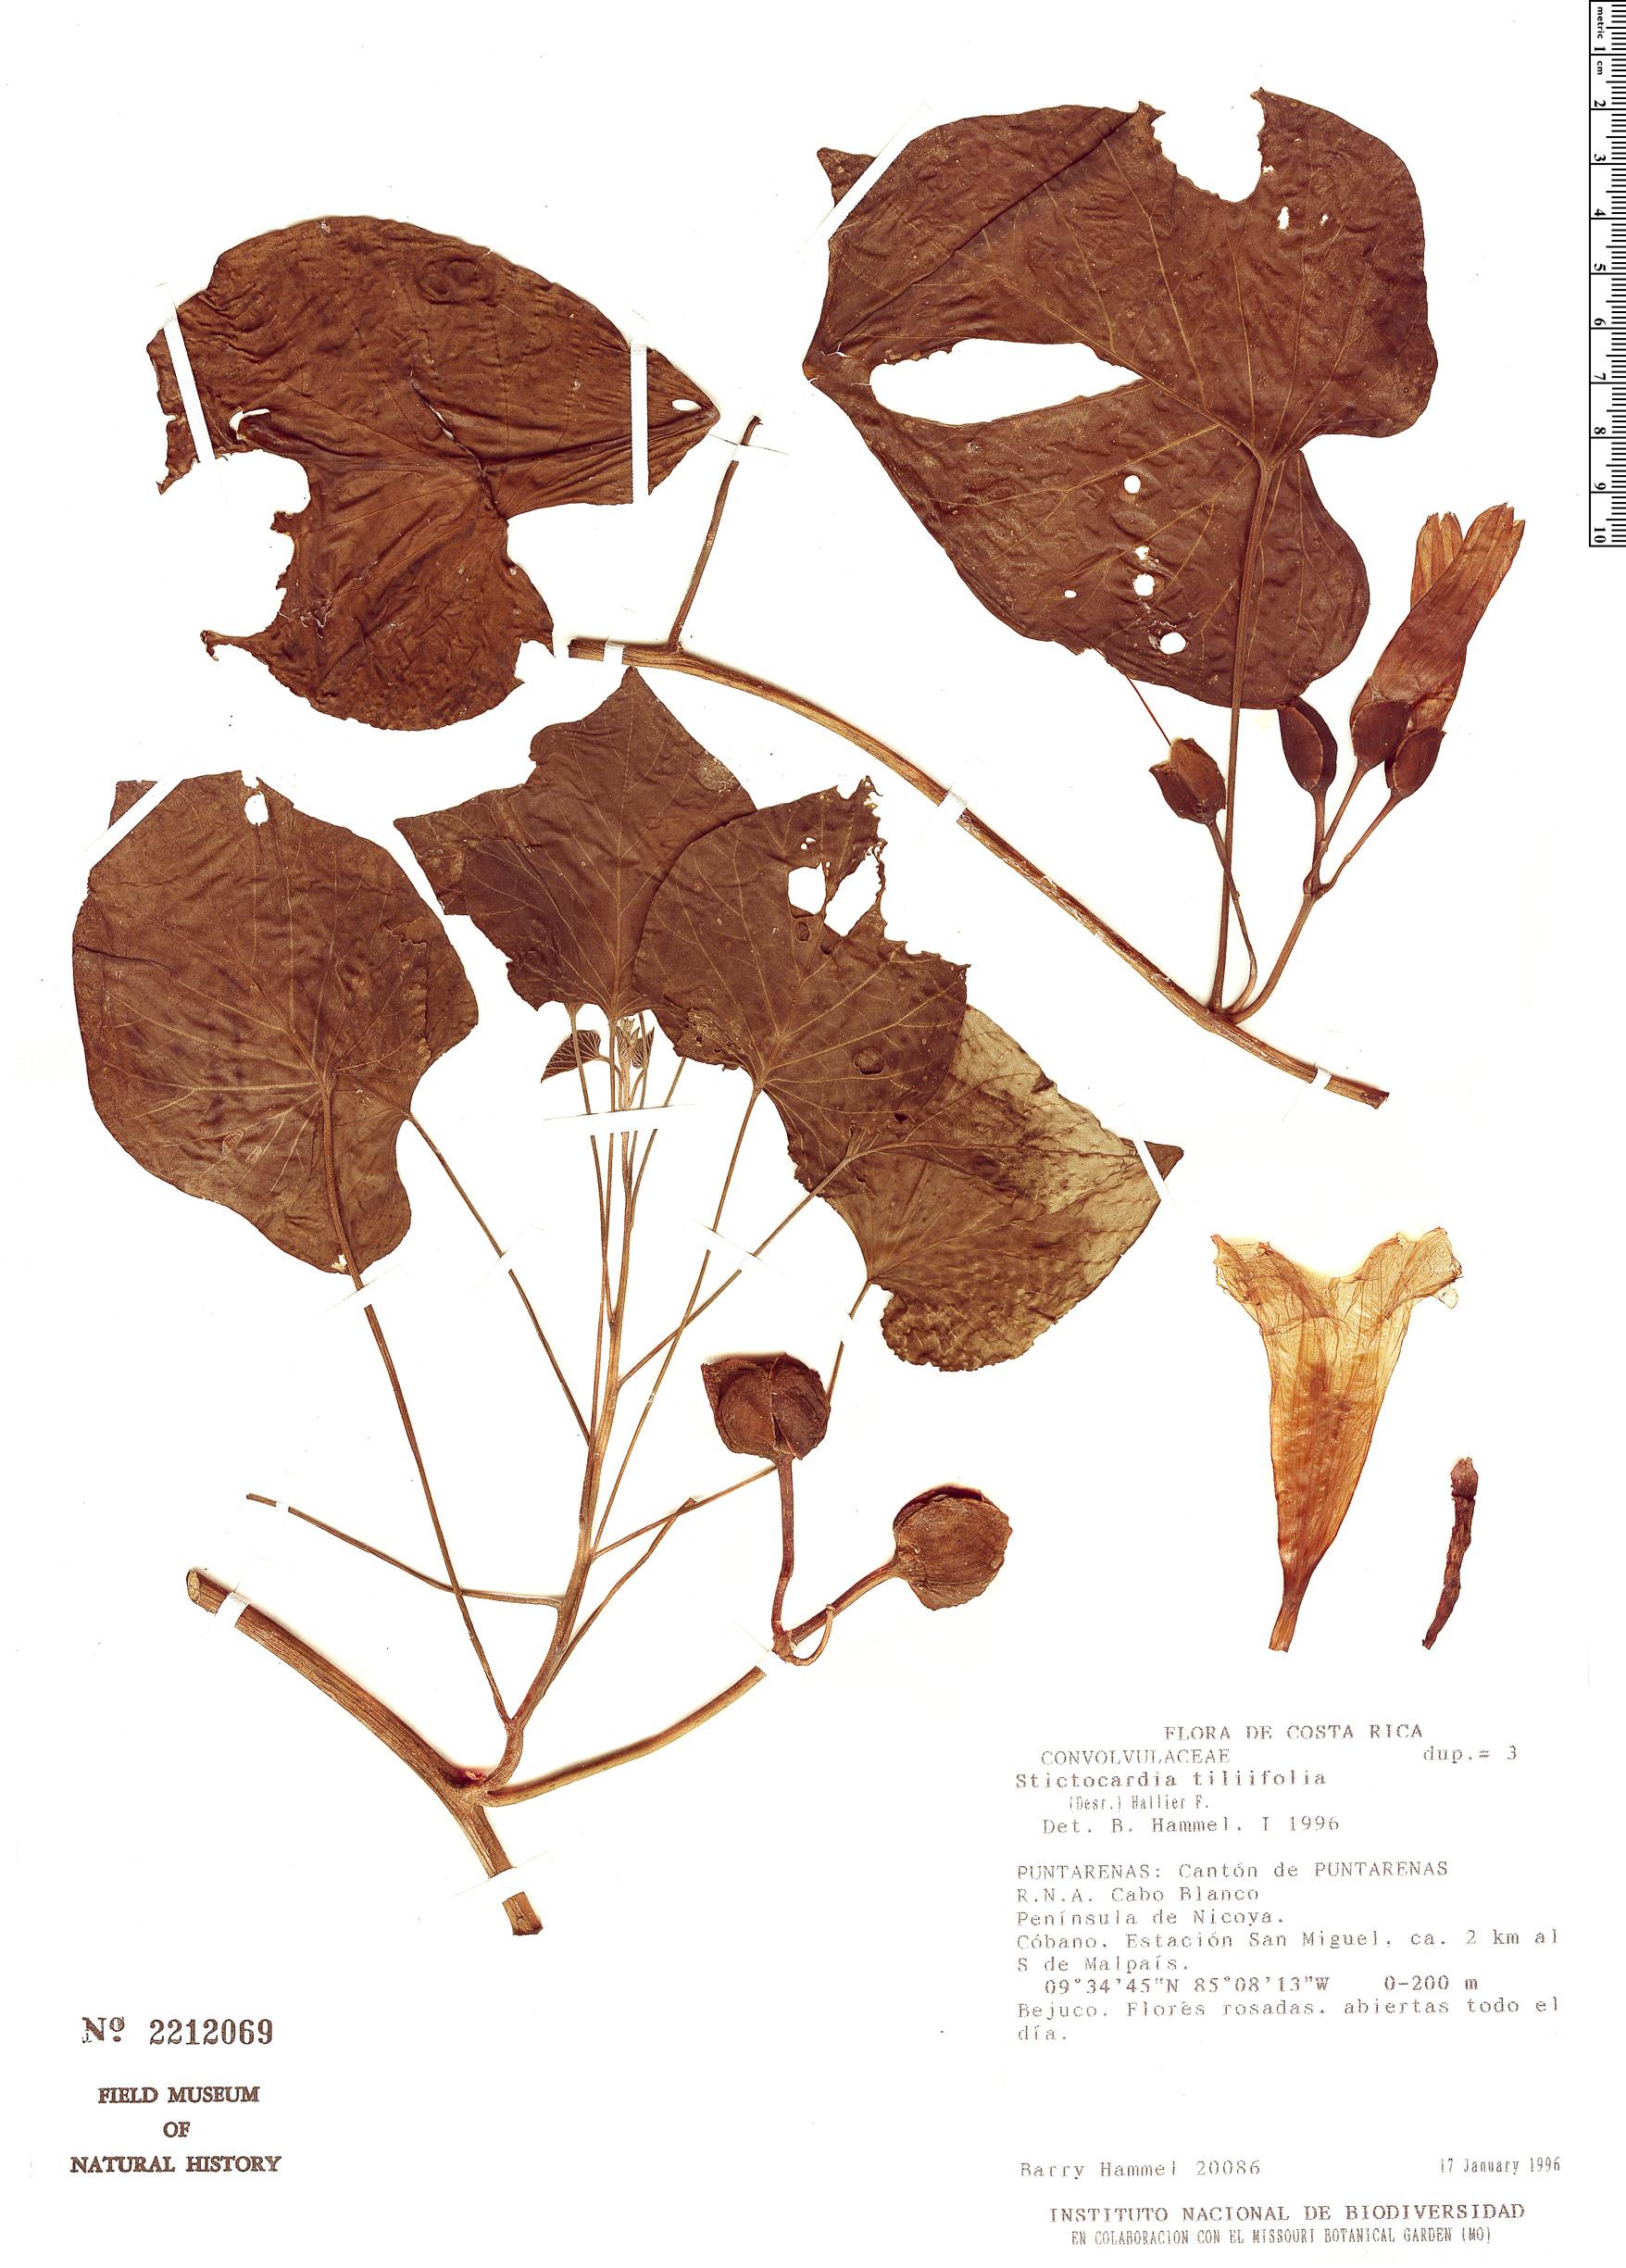 Specimen: Stictocardia tiliifolia